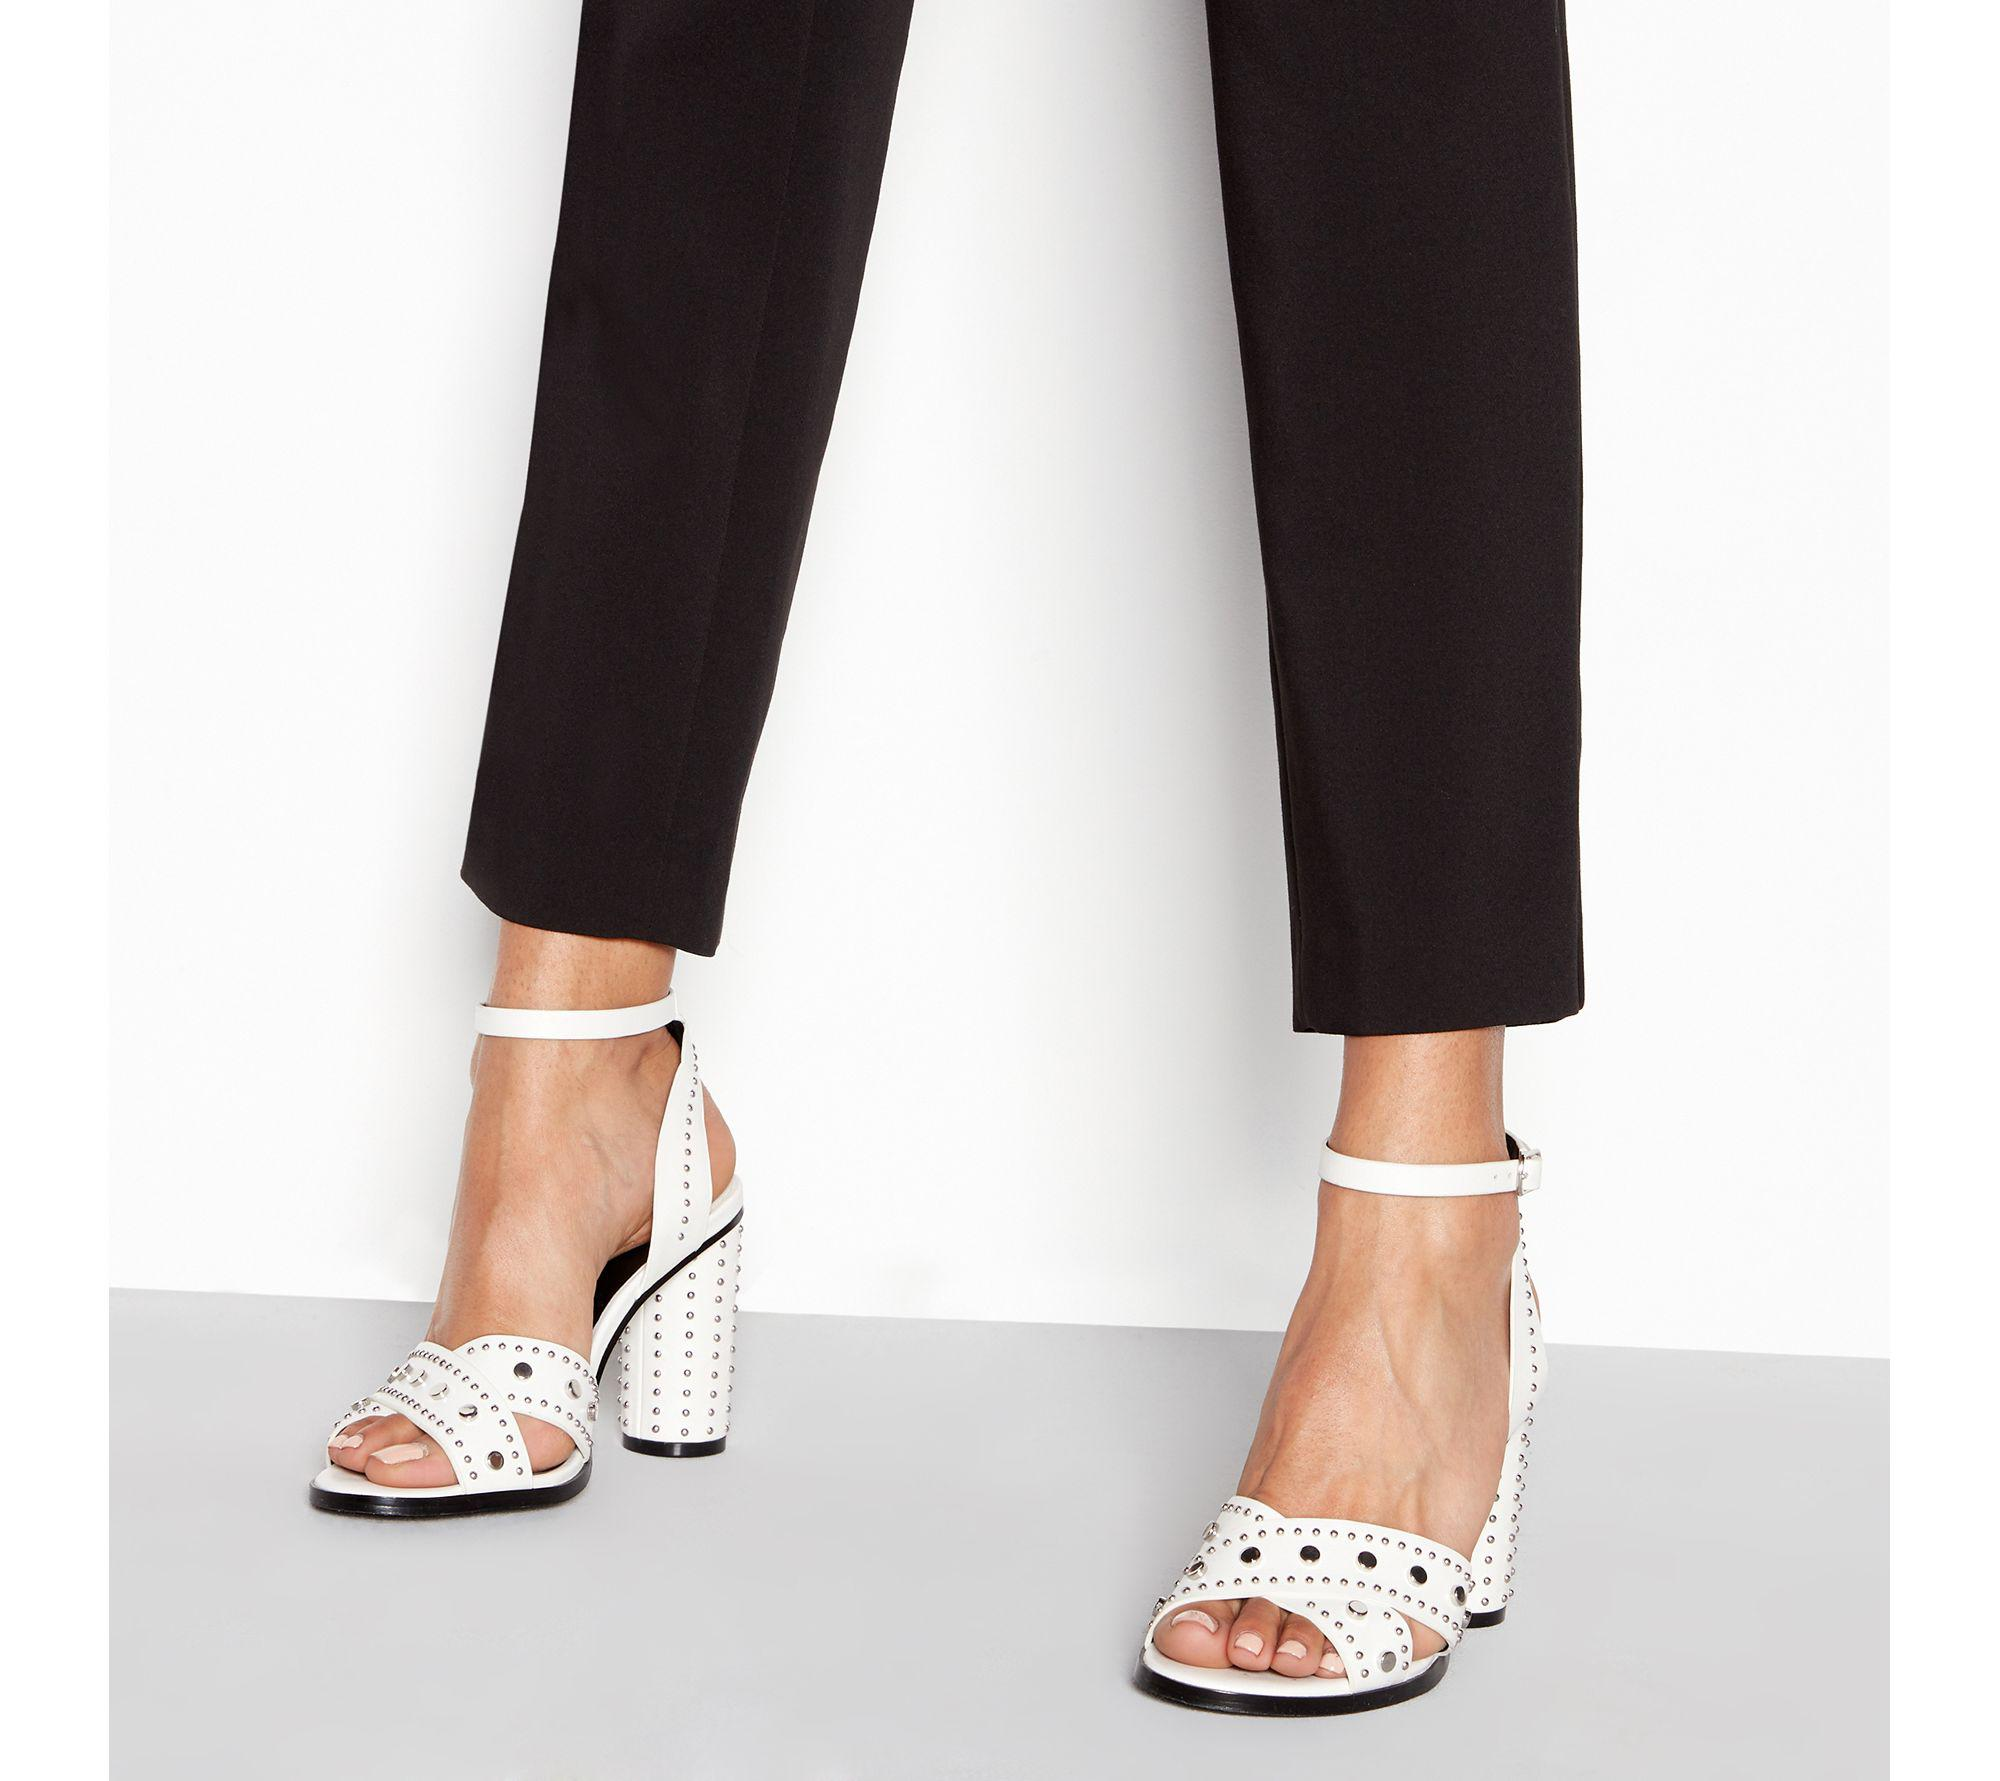 5757085f602 Faith White Stud  lynx  High Block Heel Ankle Strap Sandals in White ...